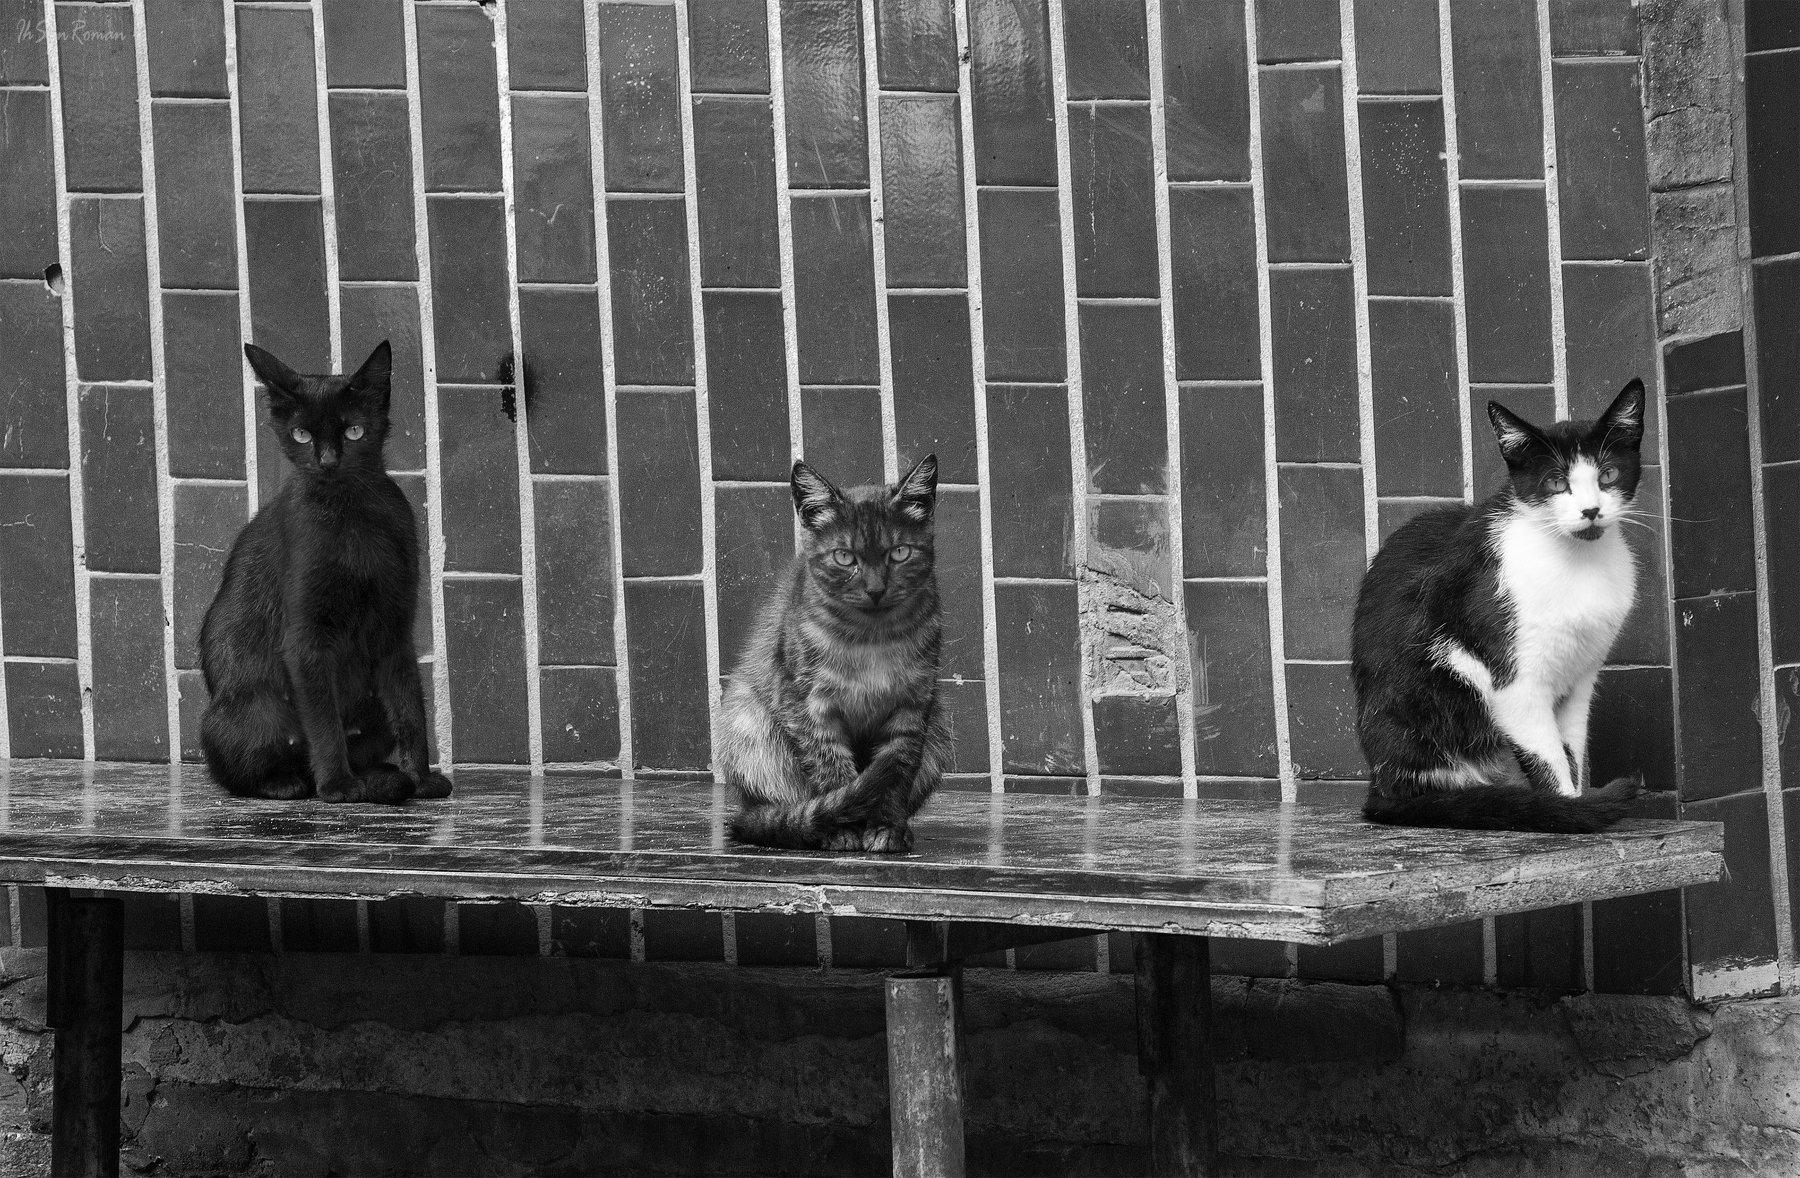 коты,котяры,котики,улица,подьезд,лавочка, Roma Krasov ( Chitinskiy )